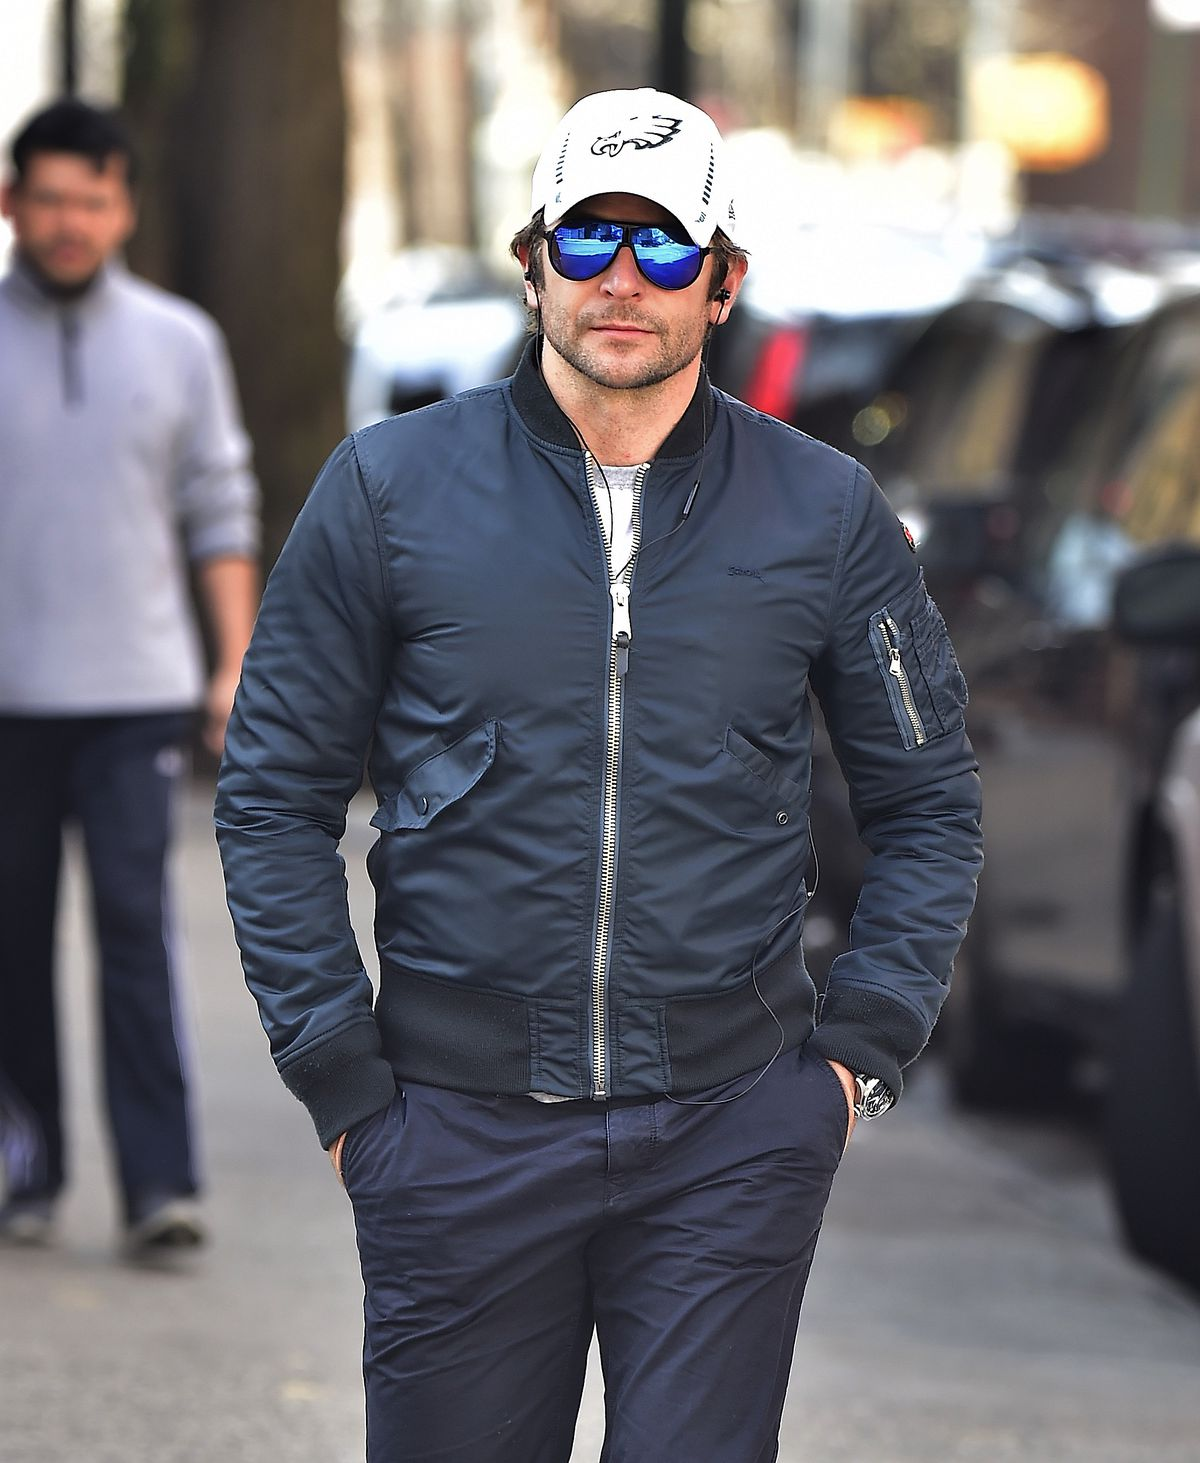 Bradley Cooper walking outside in blue sunglasses and a white Eagles baseball cap